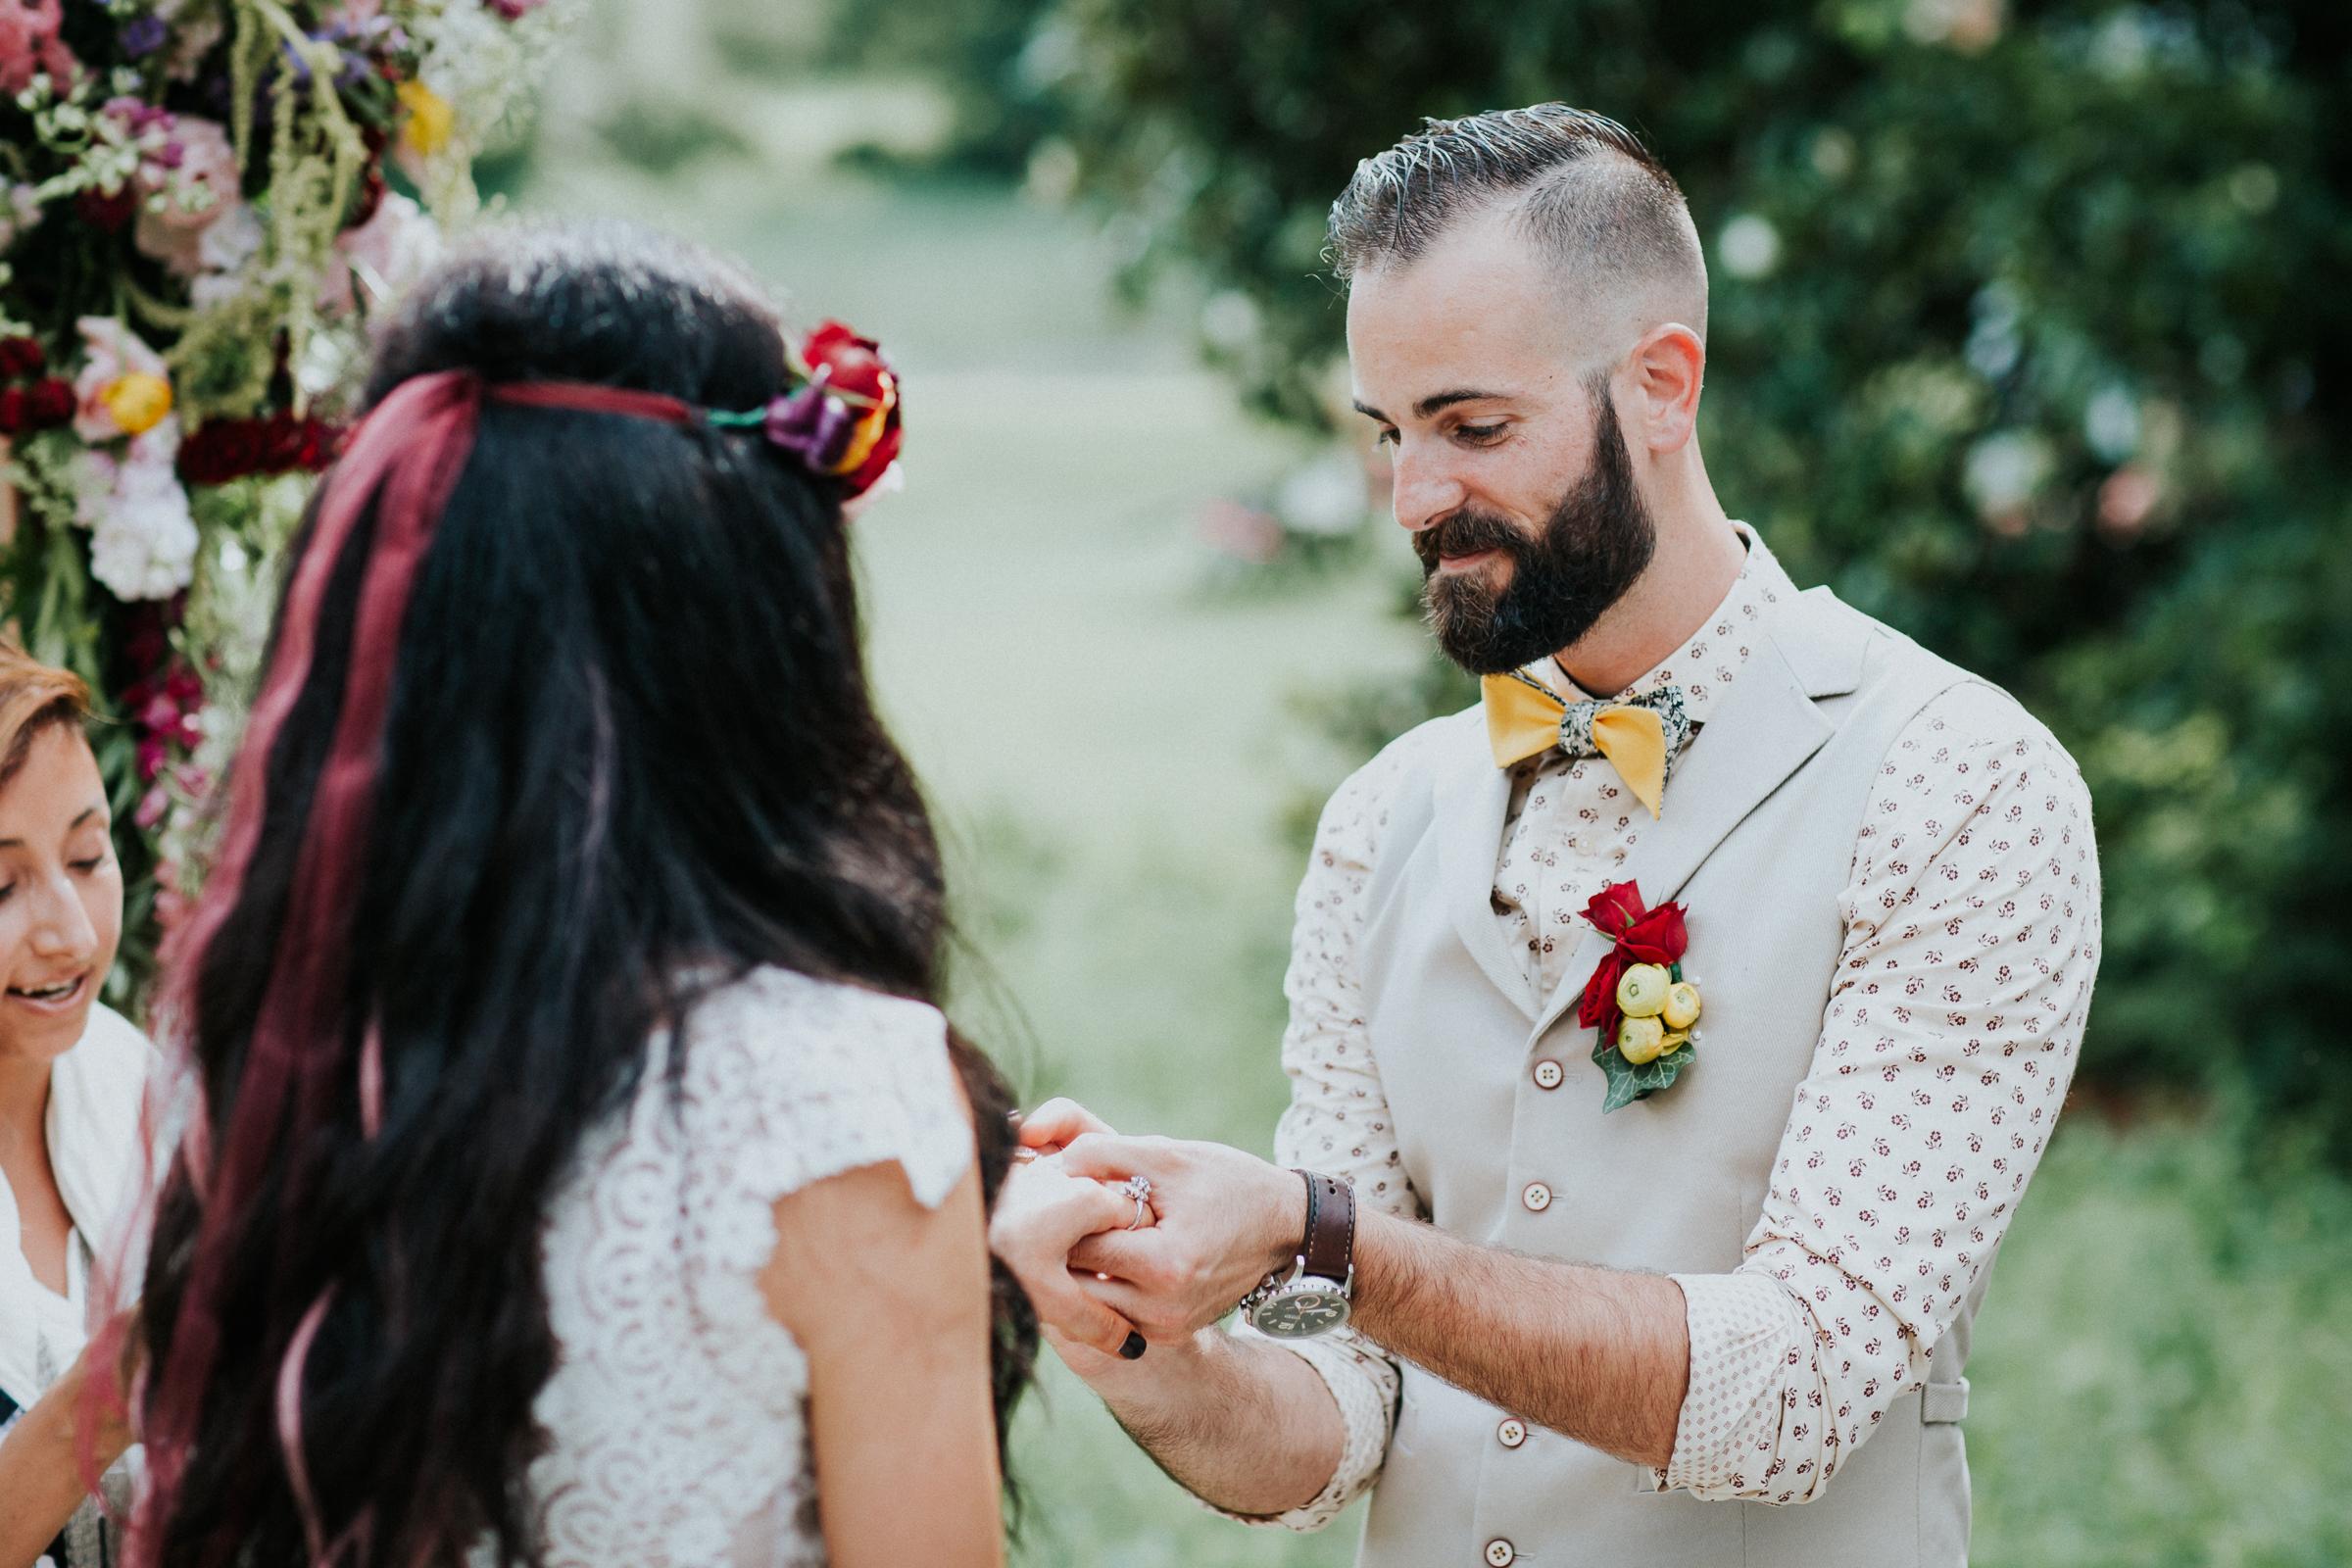 Backyard-Intimate-Adventurous-Destination-Wedding-Darien-Connecticut-Documentary-Wedding-Photography-59.jpg